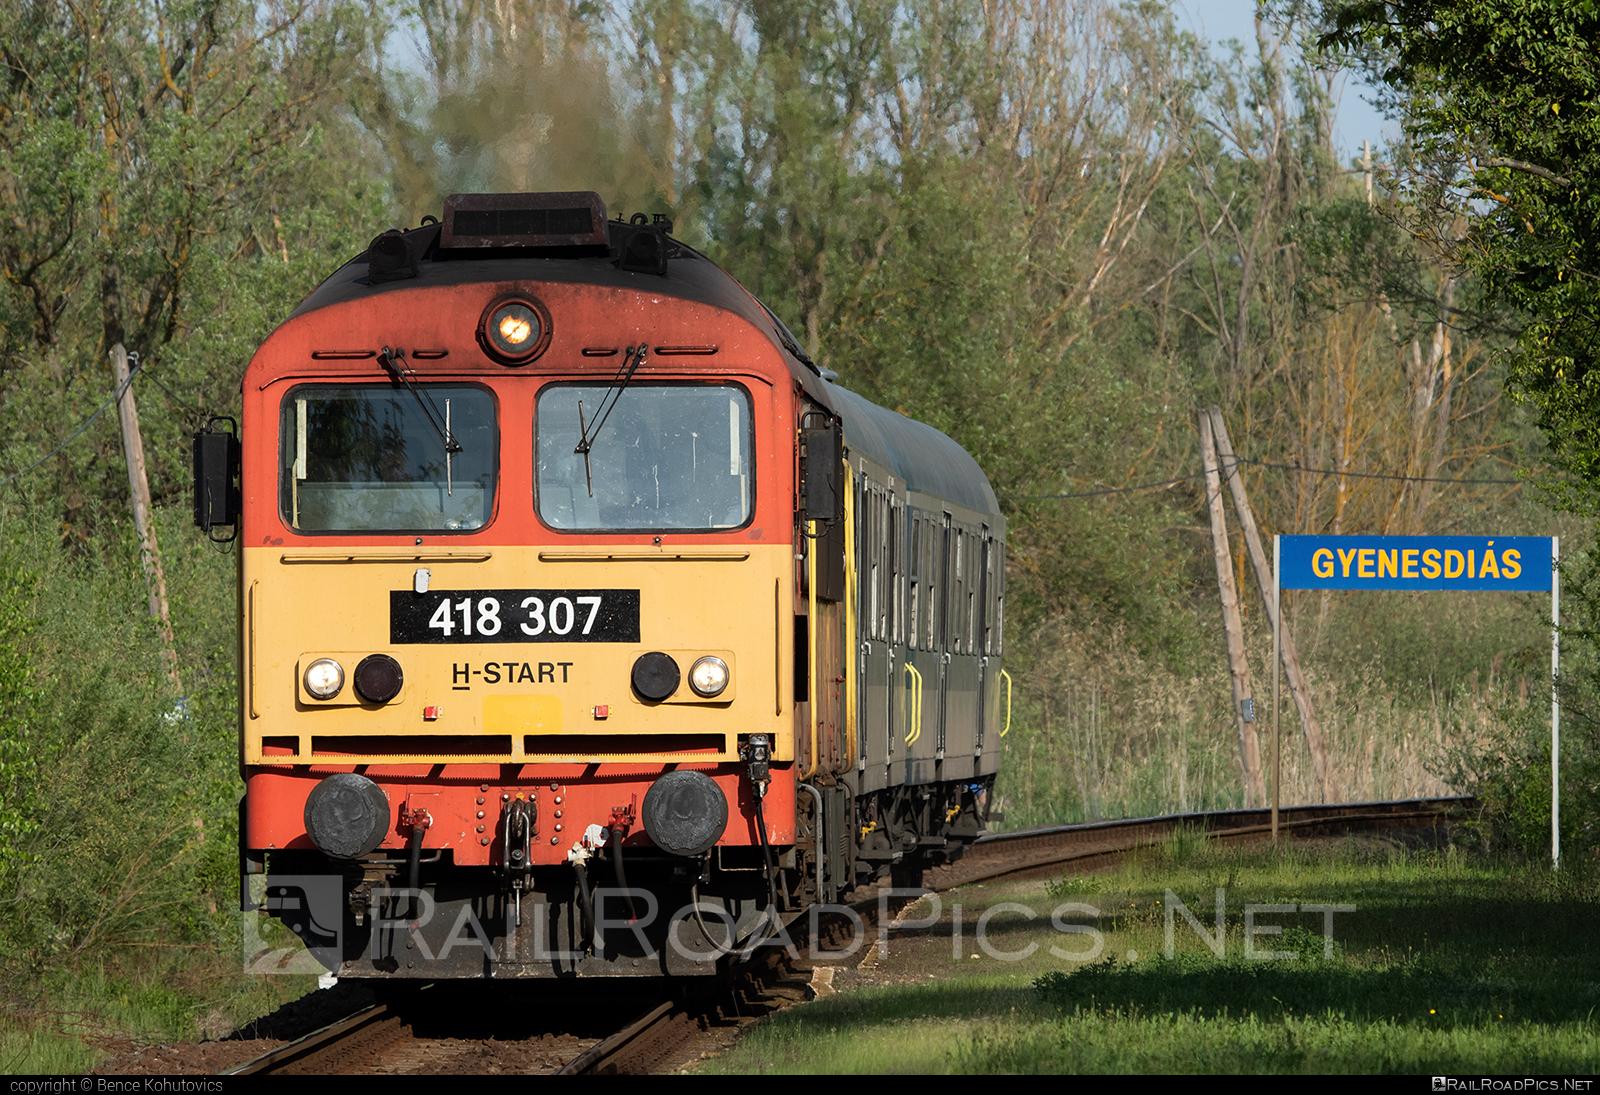 Ganz-MÁVAG DHM7-5 - 418 307 operated by MÁV-START ZRt. #dhm7 #dhm75 #ganzm41 #ganzmavag #ganzmavag418 #ganzmavagdhm7 #ganzmavagdhm75 #ganzmavagm41 #m41locomotive #mavstart #mavstartzrt